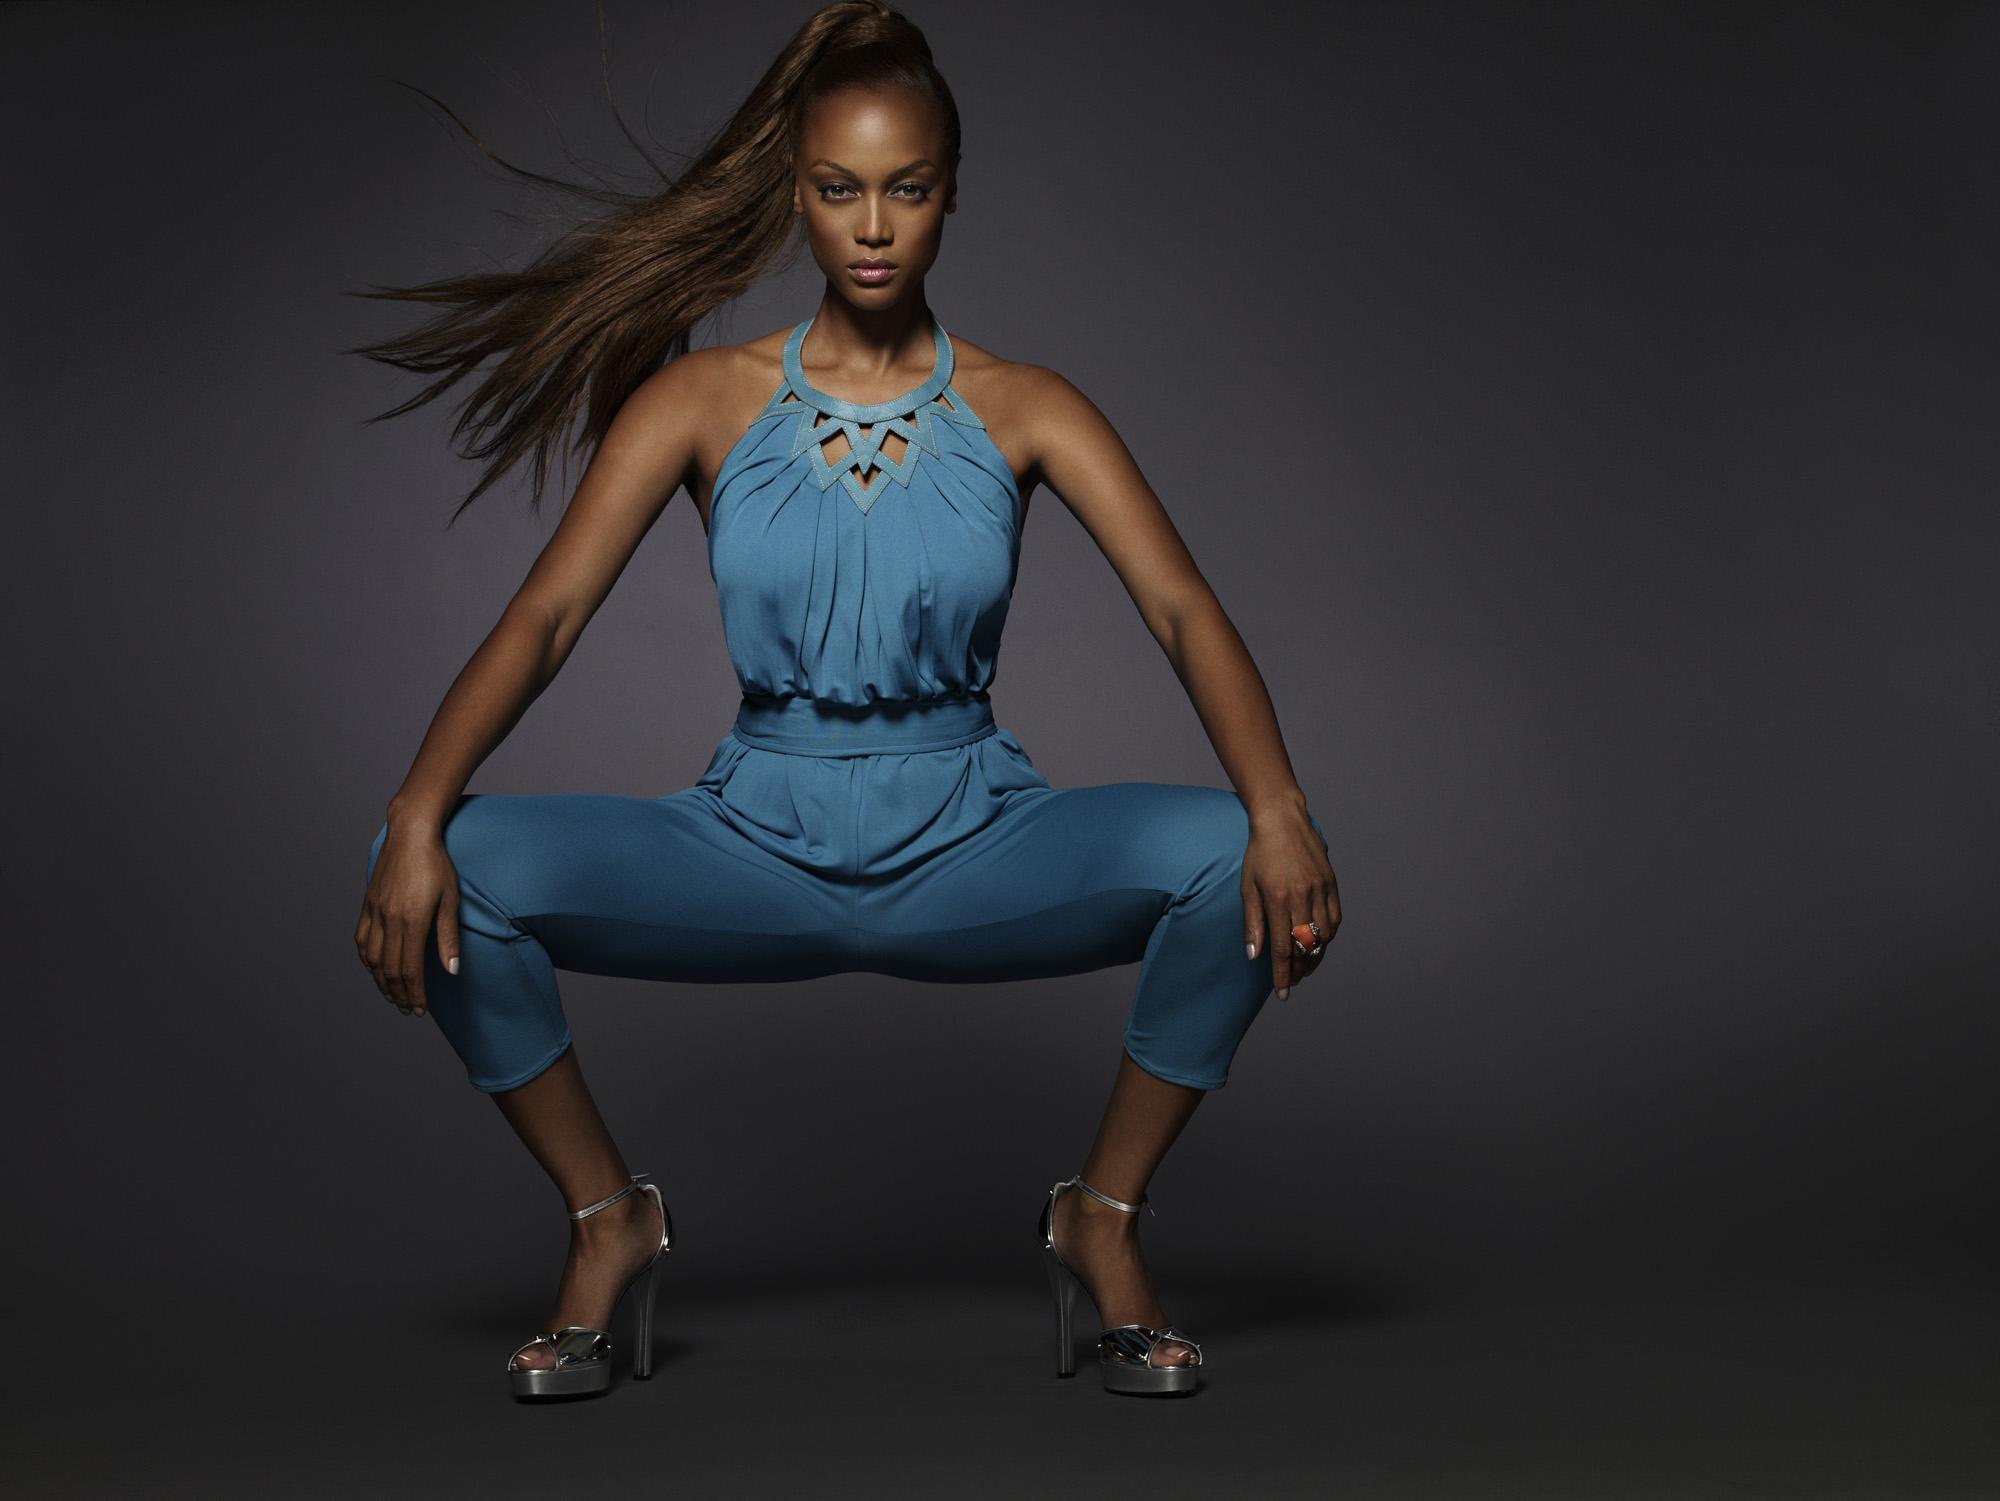 tyra banks super model poster